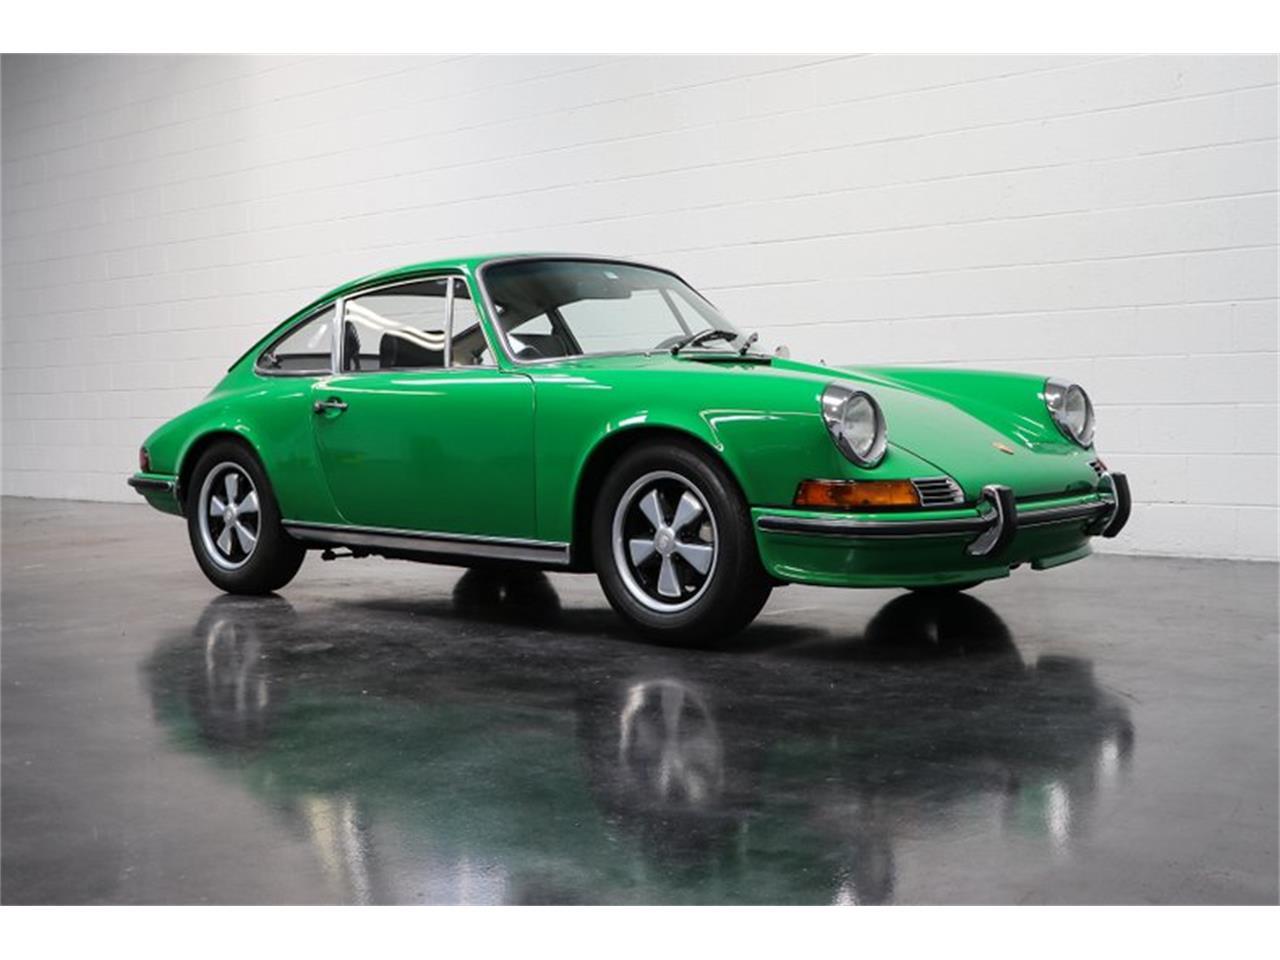 Large Picture of Classic 1970 Porsche 911S located in Costa Mesa California - $214,950.00 - PJED